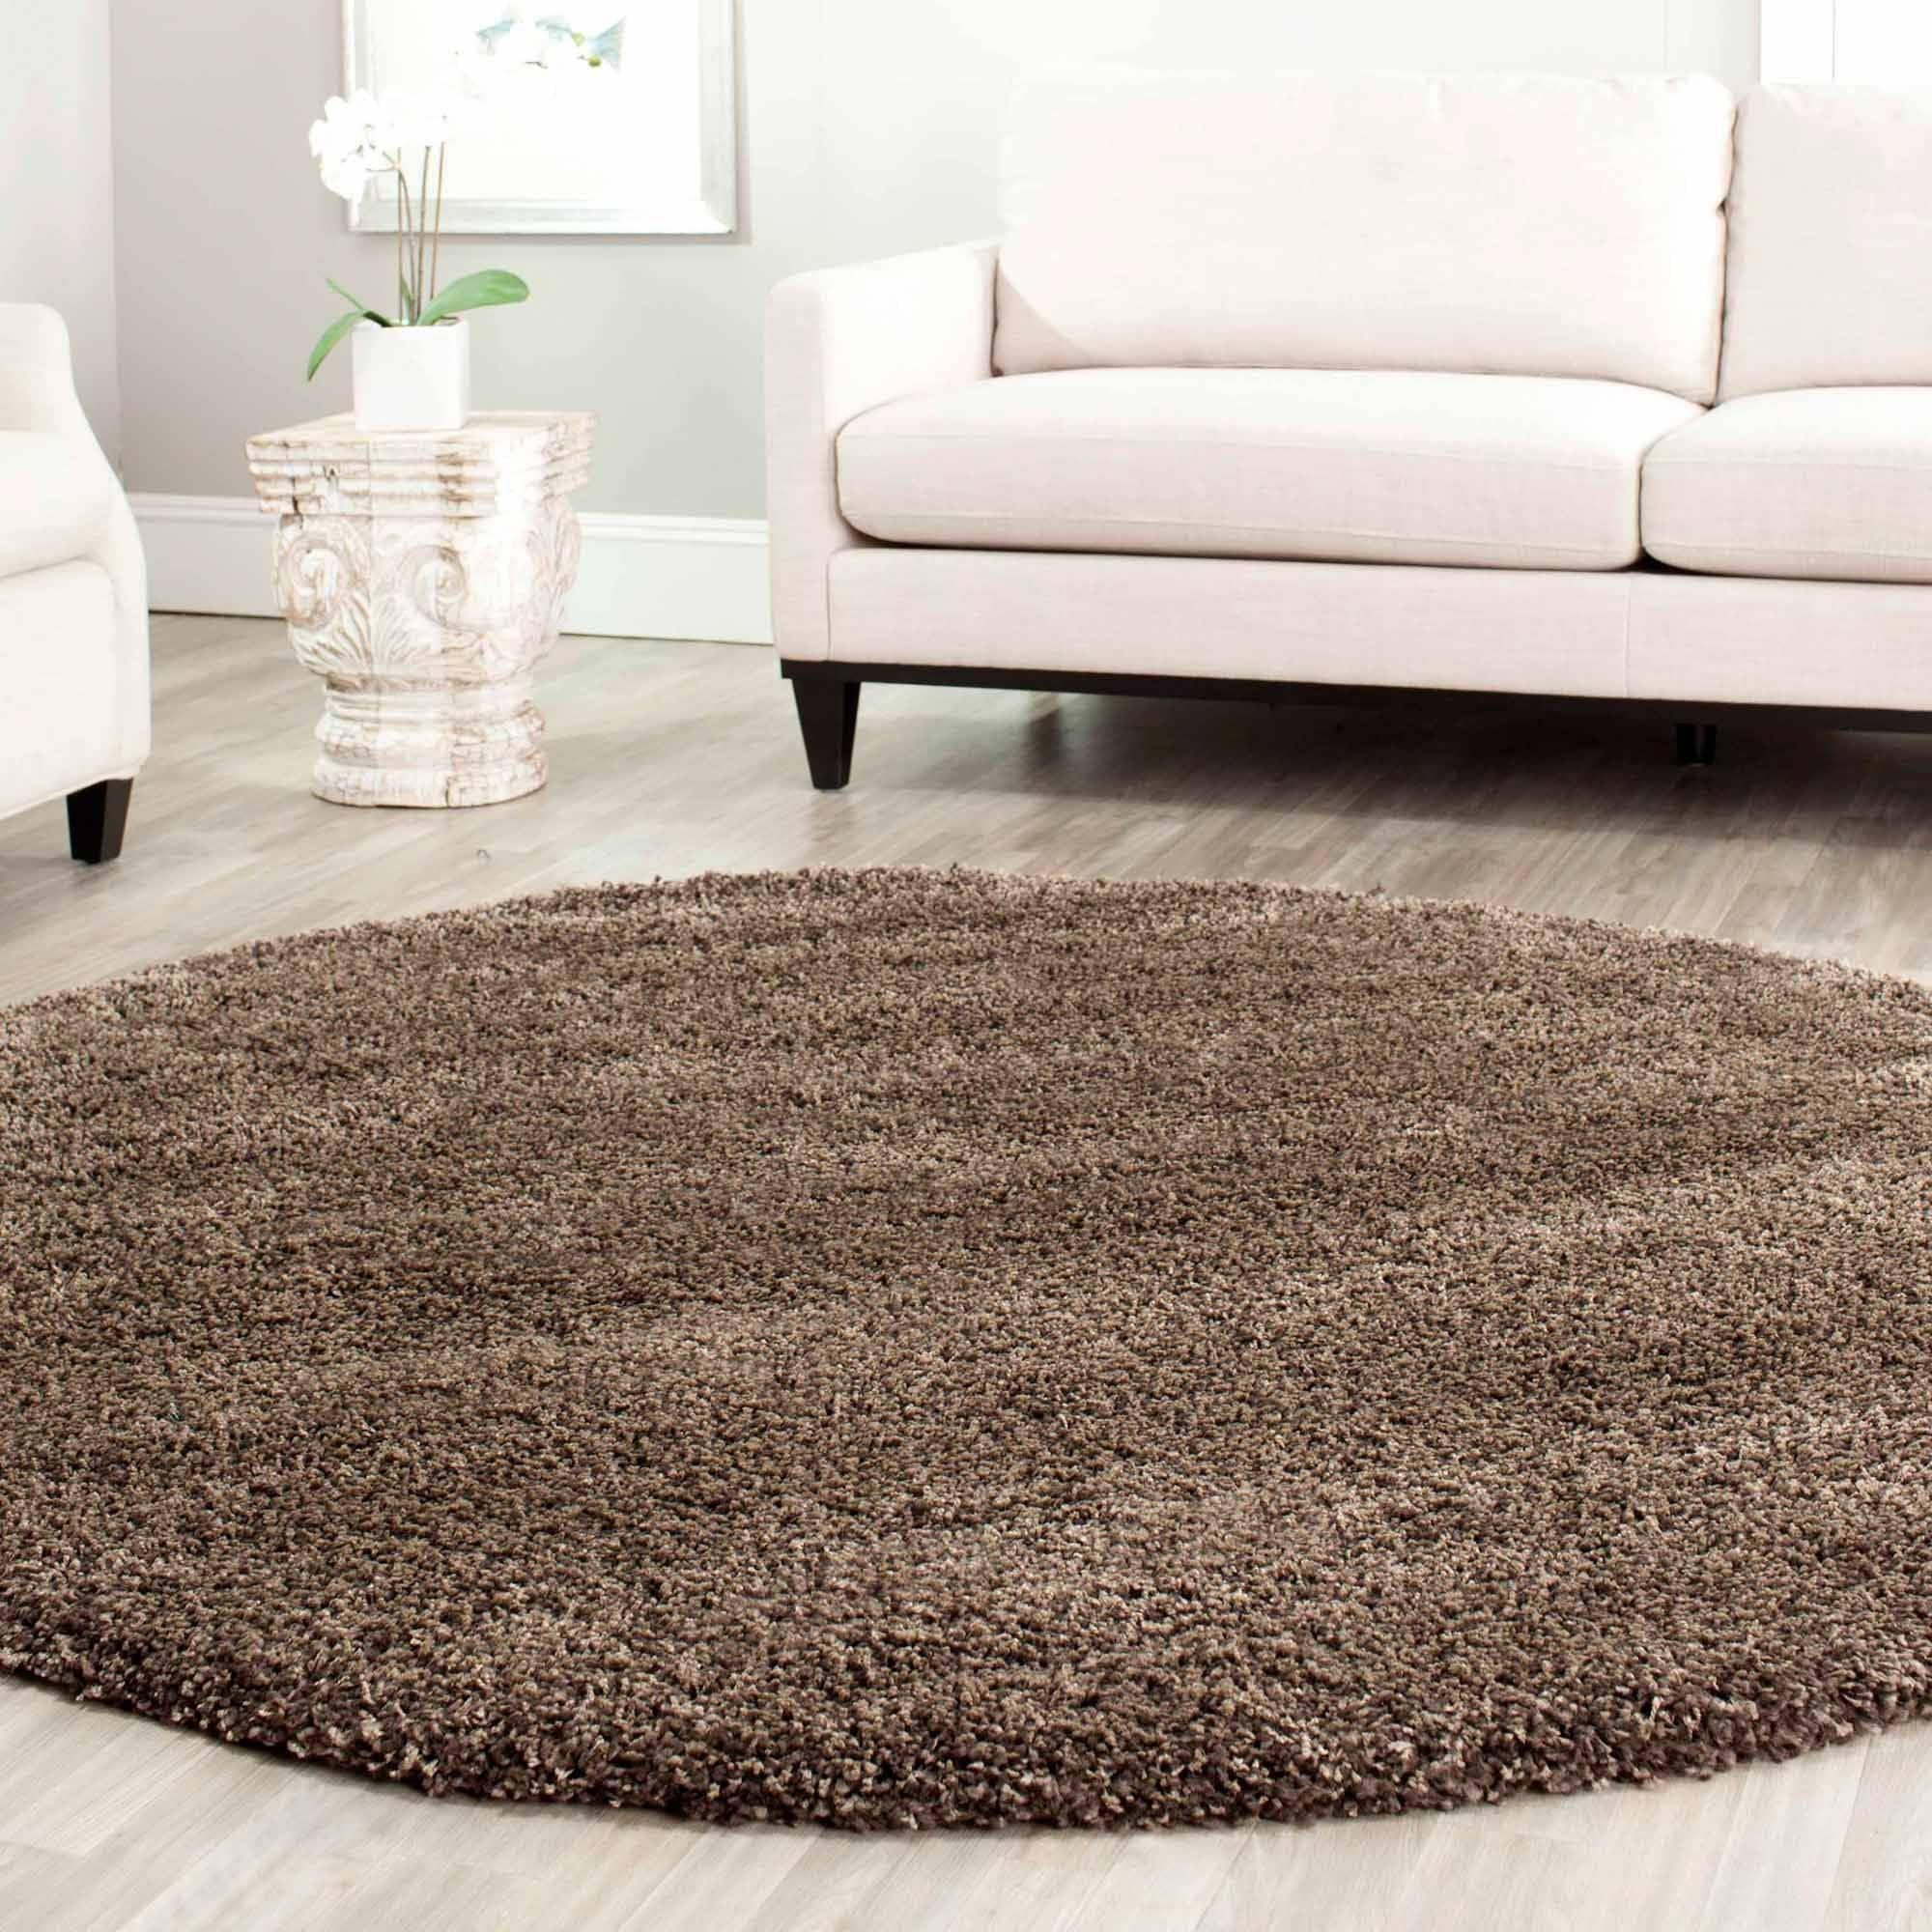 lis round rugs regent rug de area p fleur